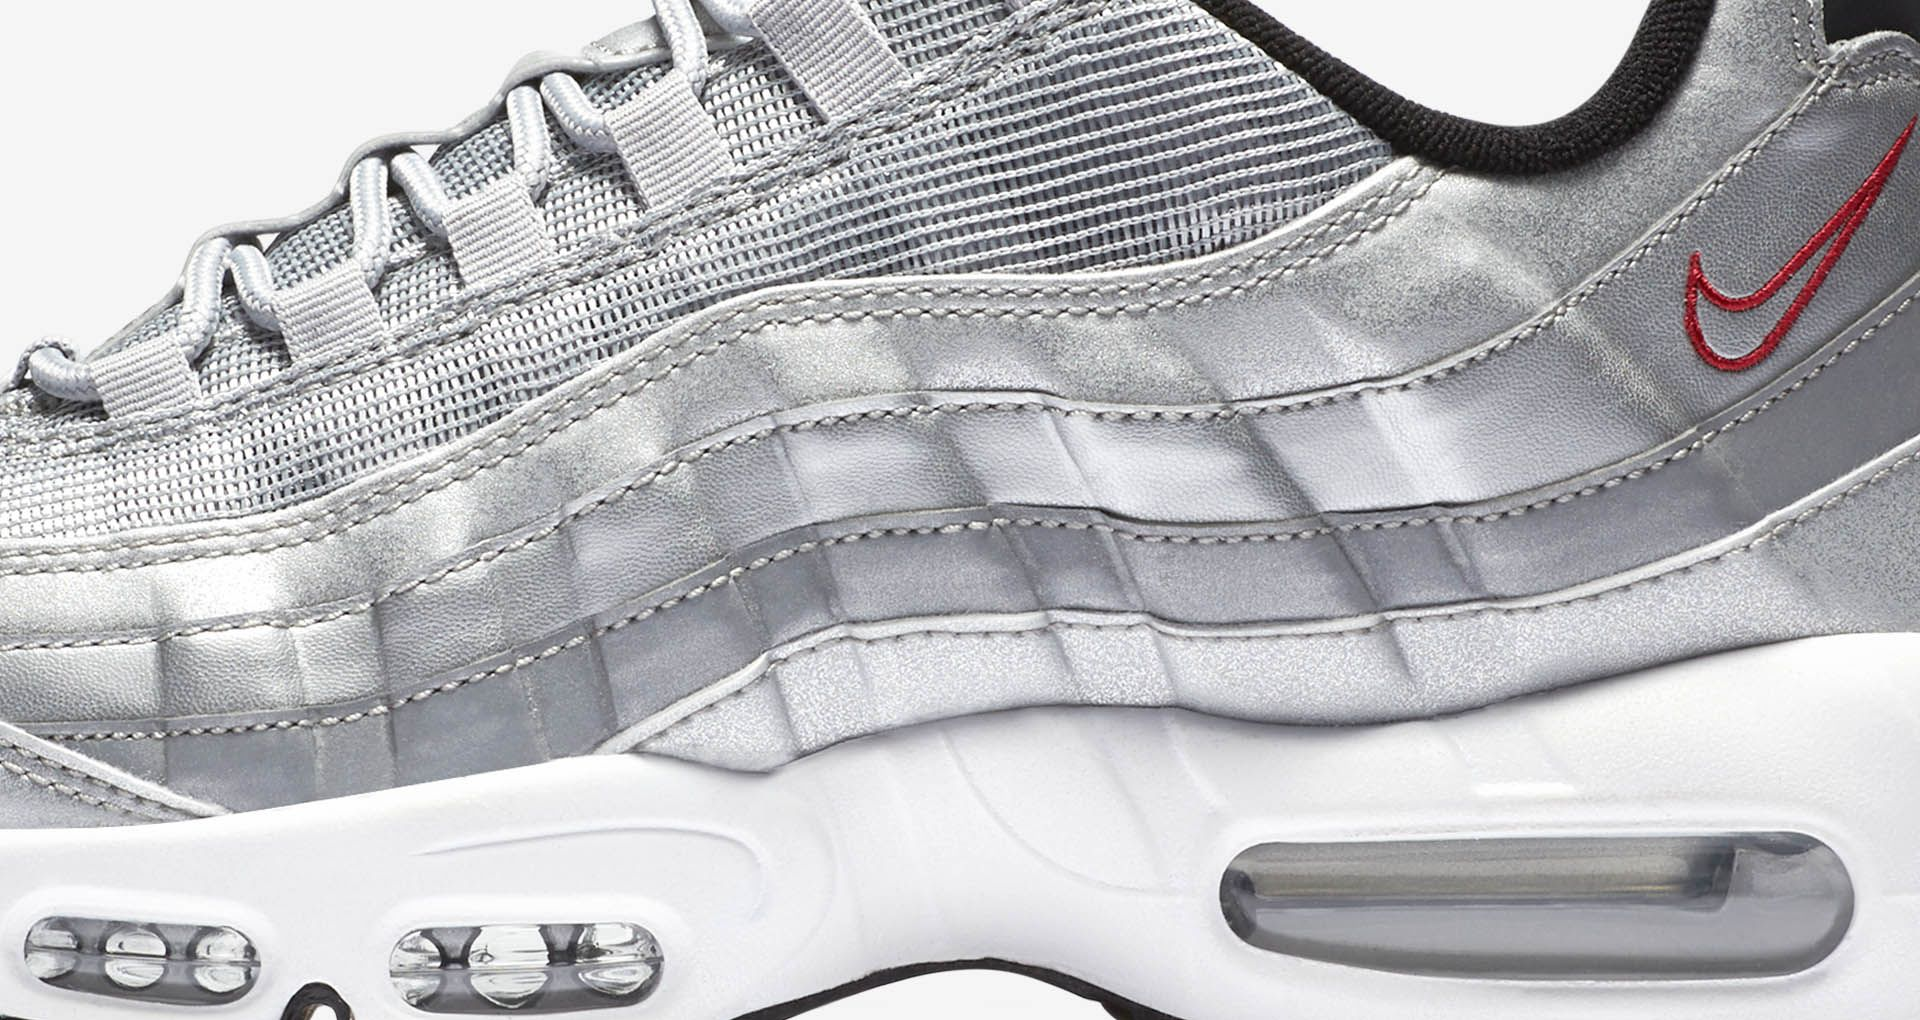 df5431a79ecab Nike Air Max 95 Premium  Metallic Silver . Nike+ SNKRS